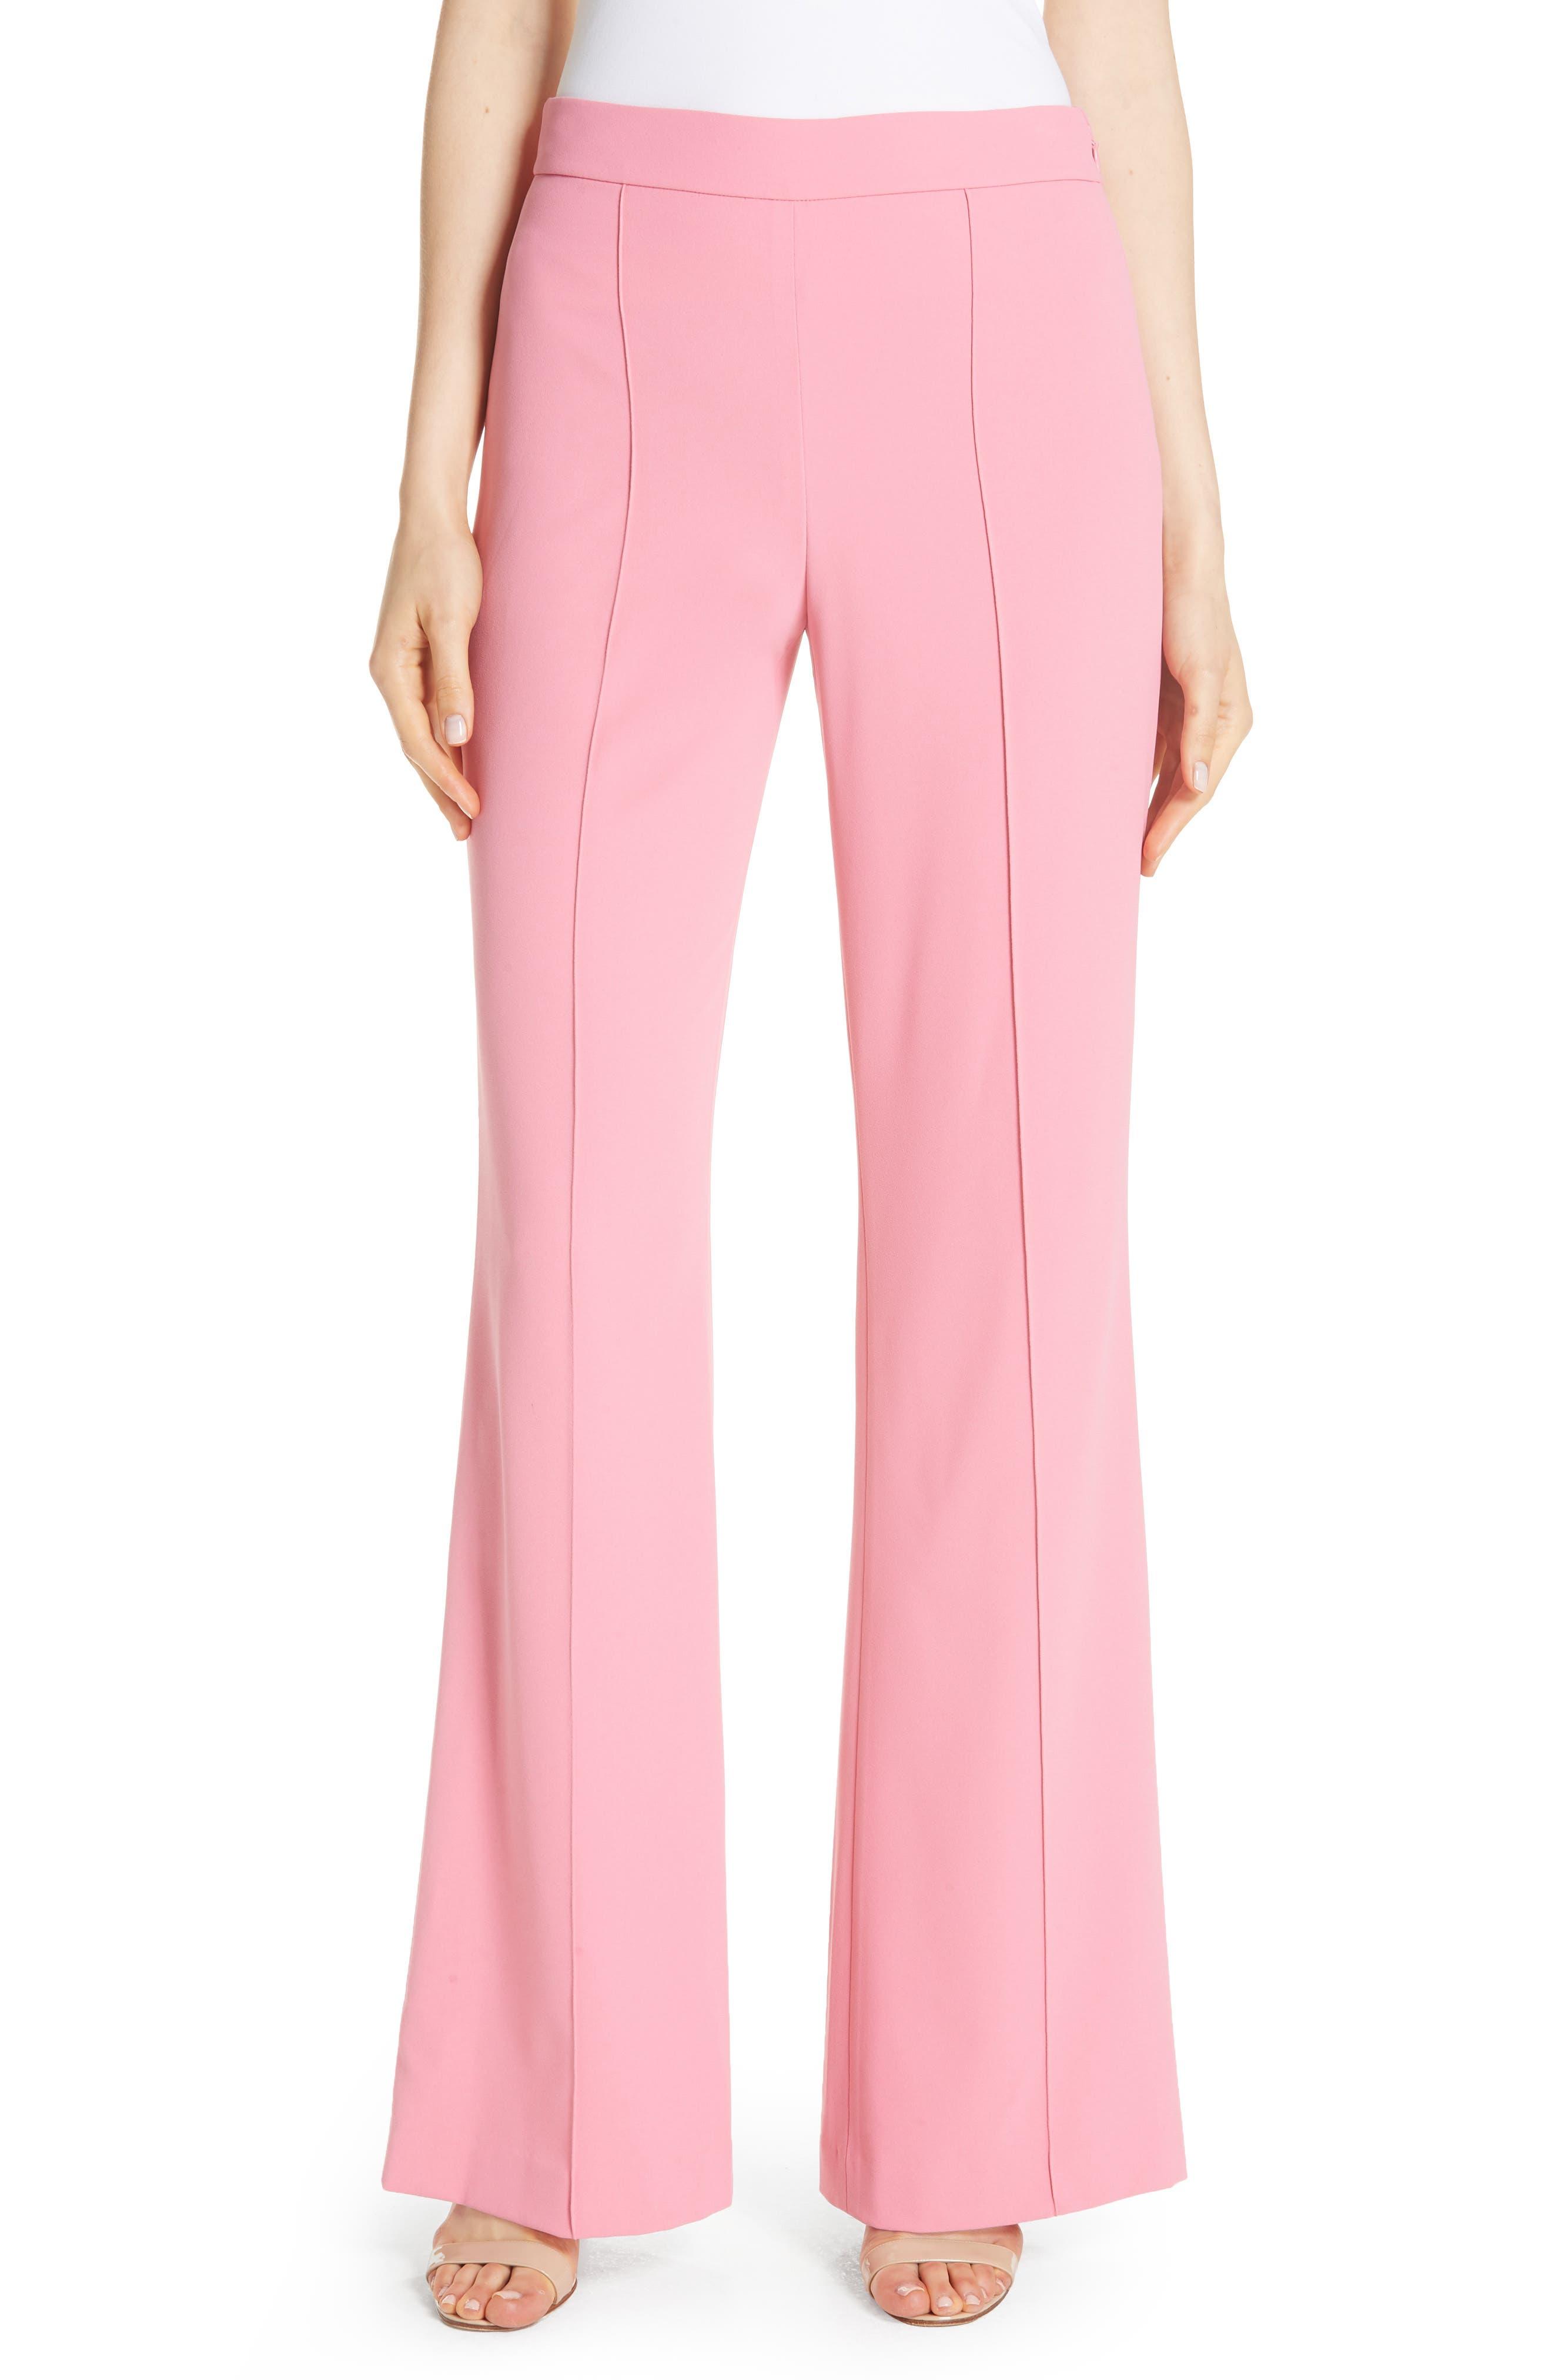 Jalisa High Waist Flare Pants,                             Main thumbnail 1, color,                             Bubblegum